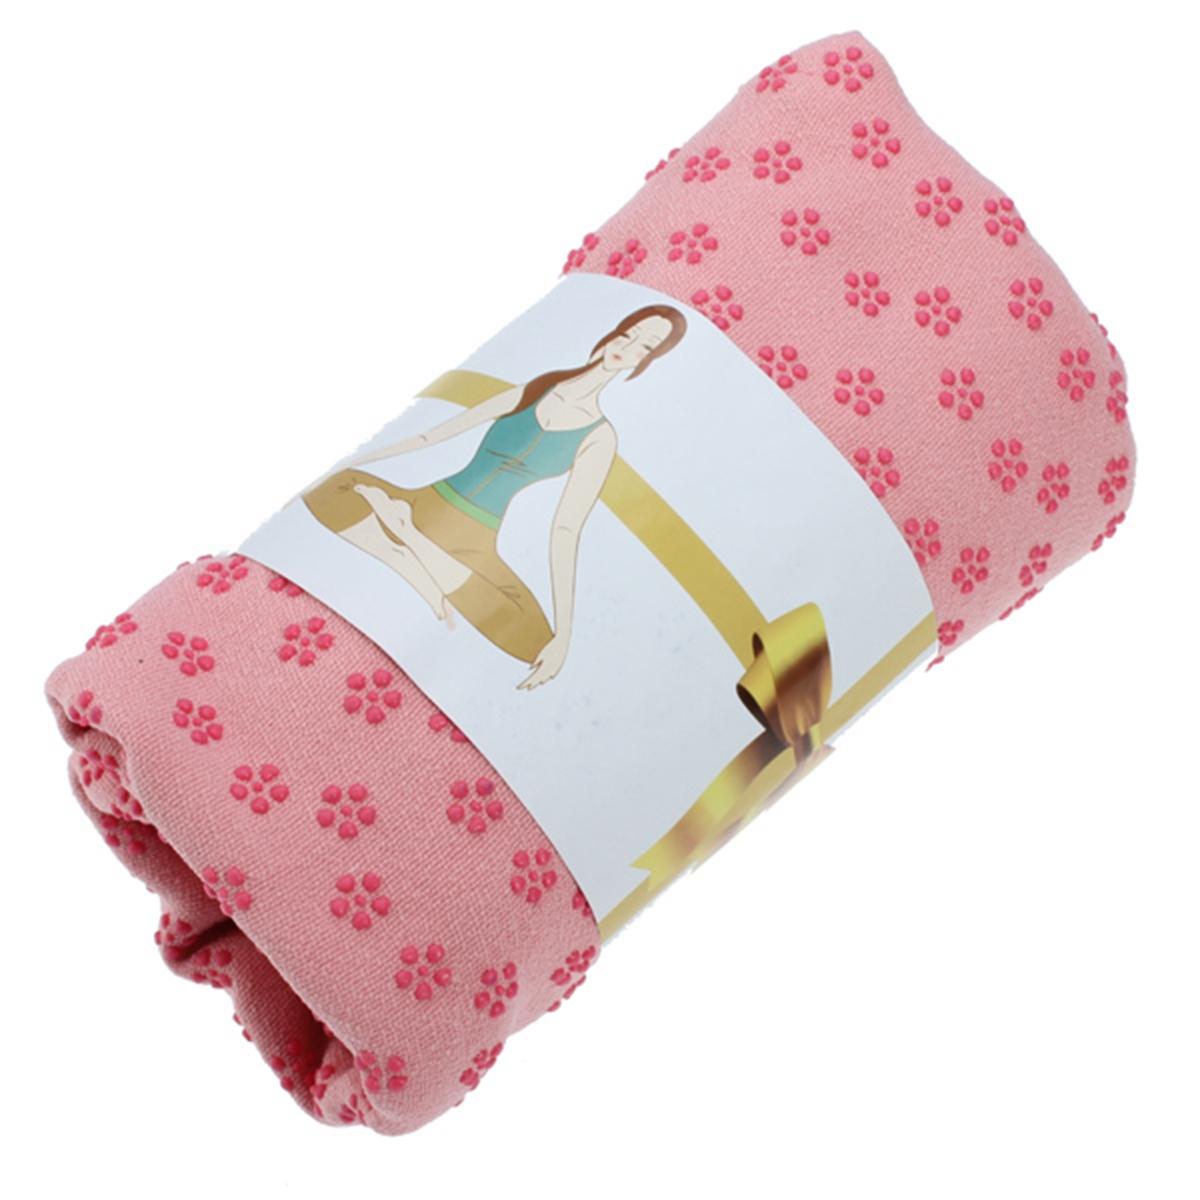 Travel Yoga Mat Or Towel: Sport Travel Exercise Yoga Mat Cover Towel Blanket Non